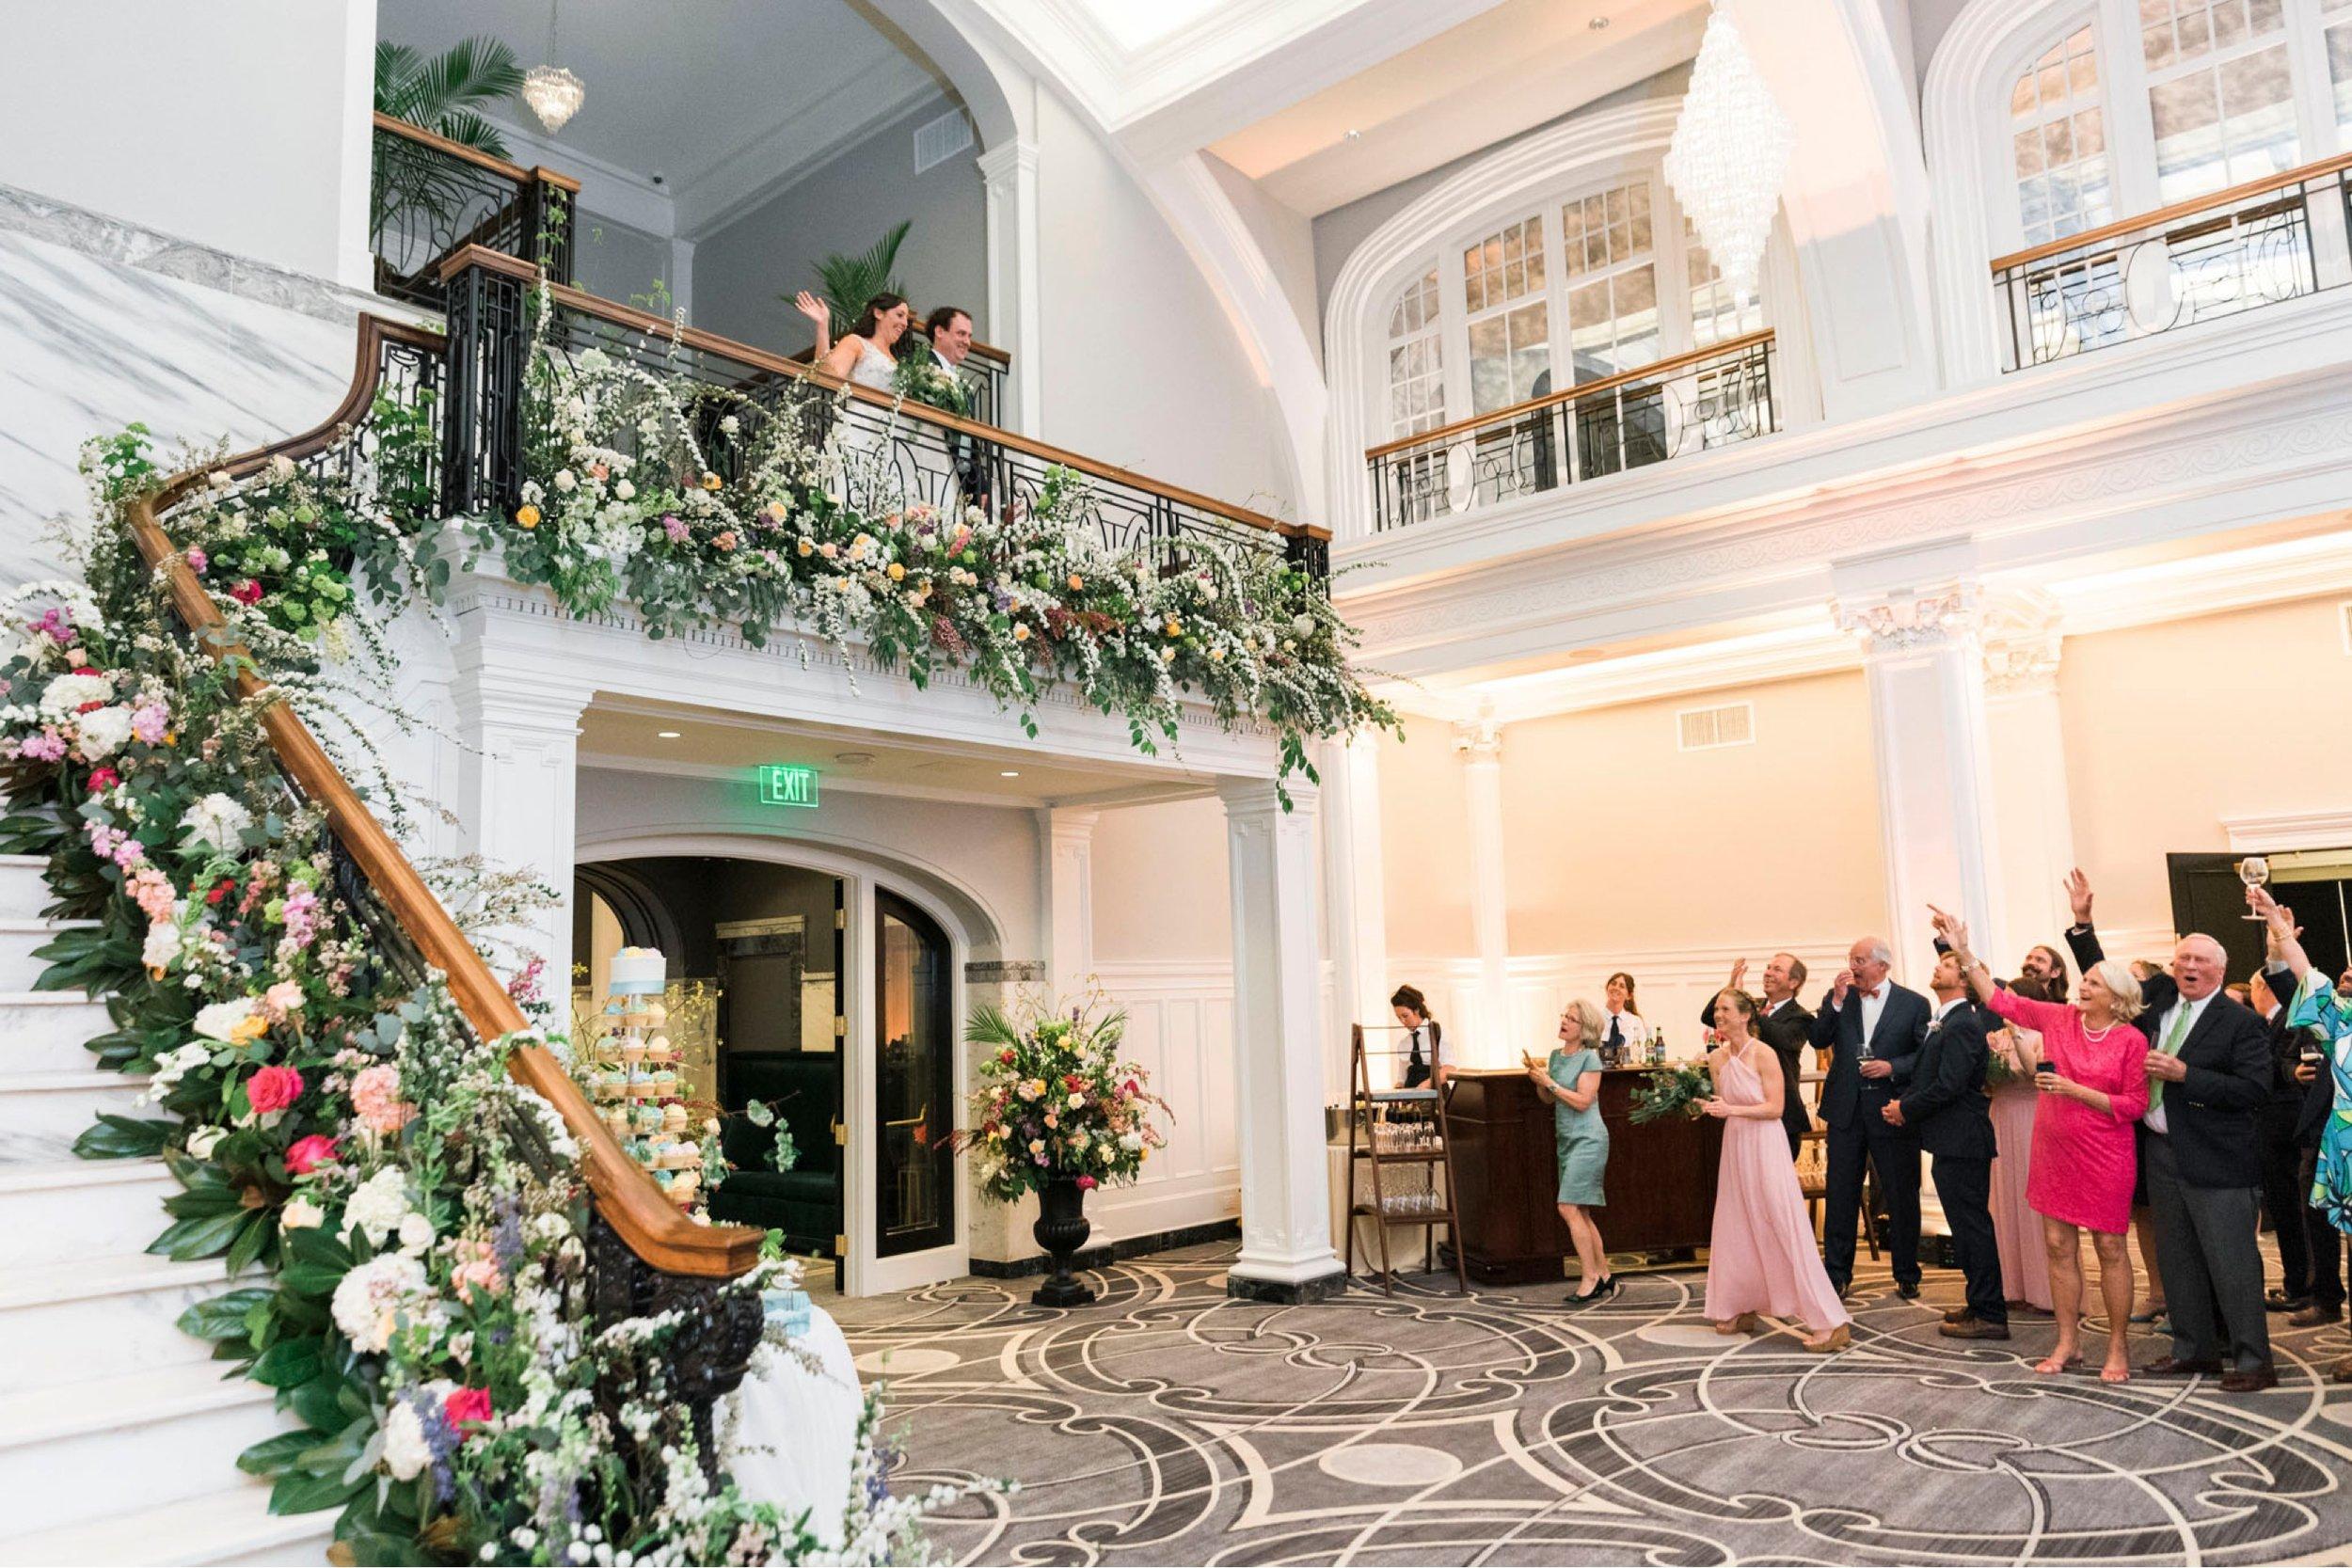 TheVirginianHotel_LynchburgVA_TheVirginianHotelWedding_Virginiaweddingphotographer_Lynchburgvawedding 11.jpg